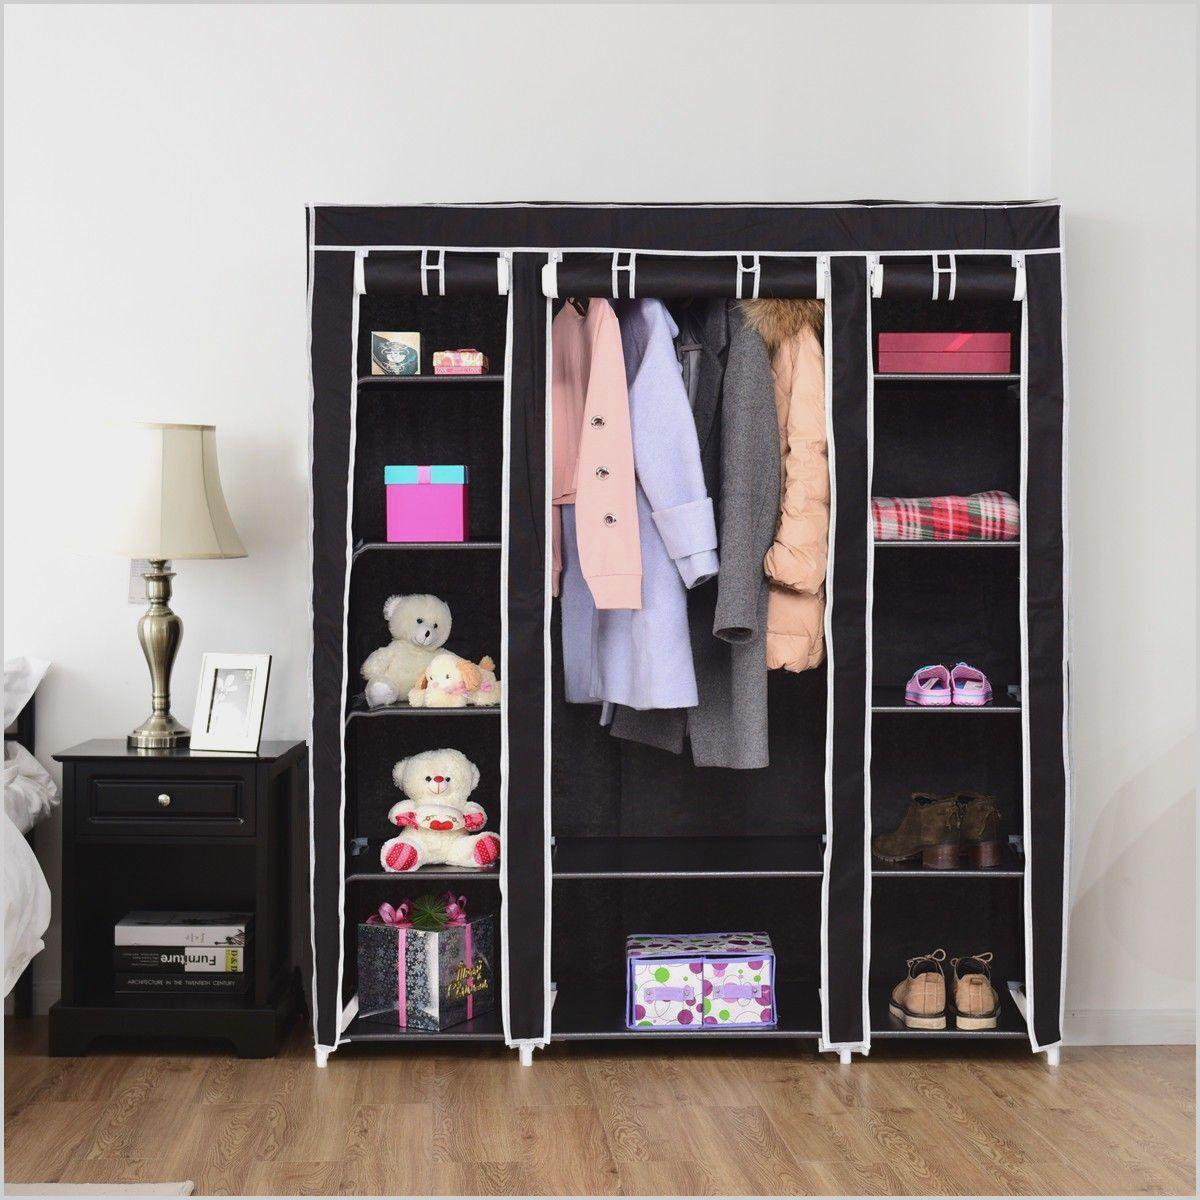 Storage For Clothes In Small Bedroom Em 2020 Com Imagens